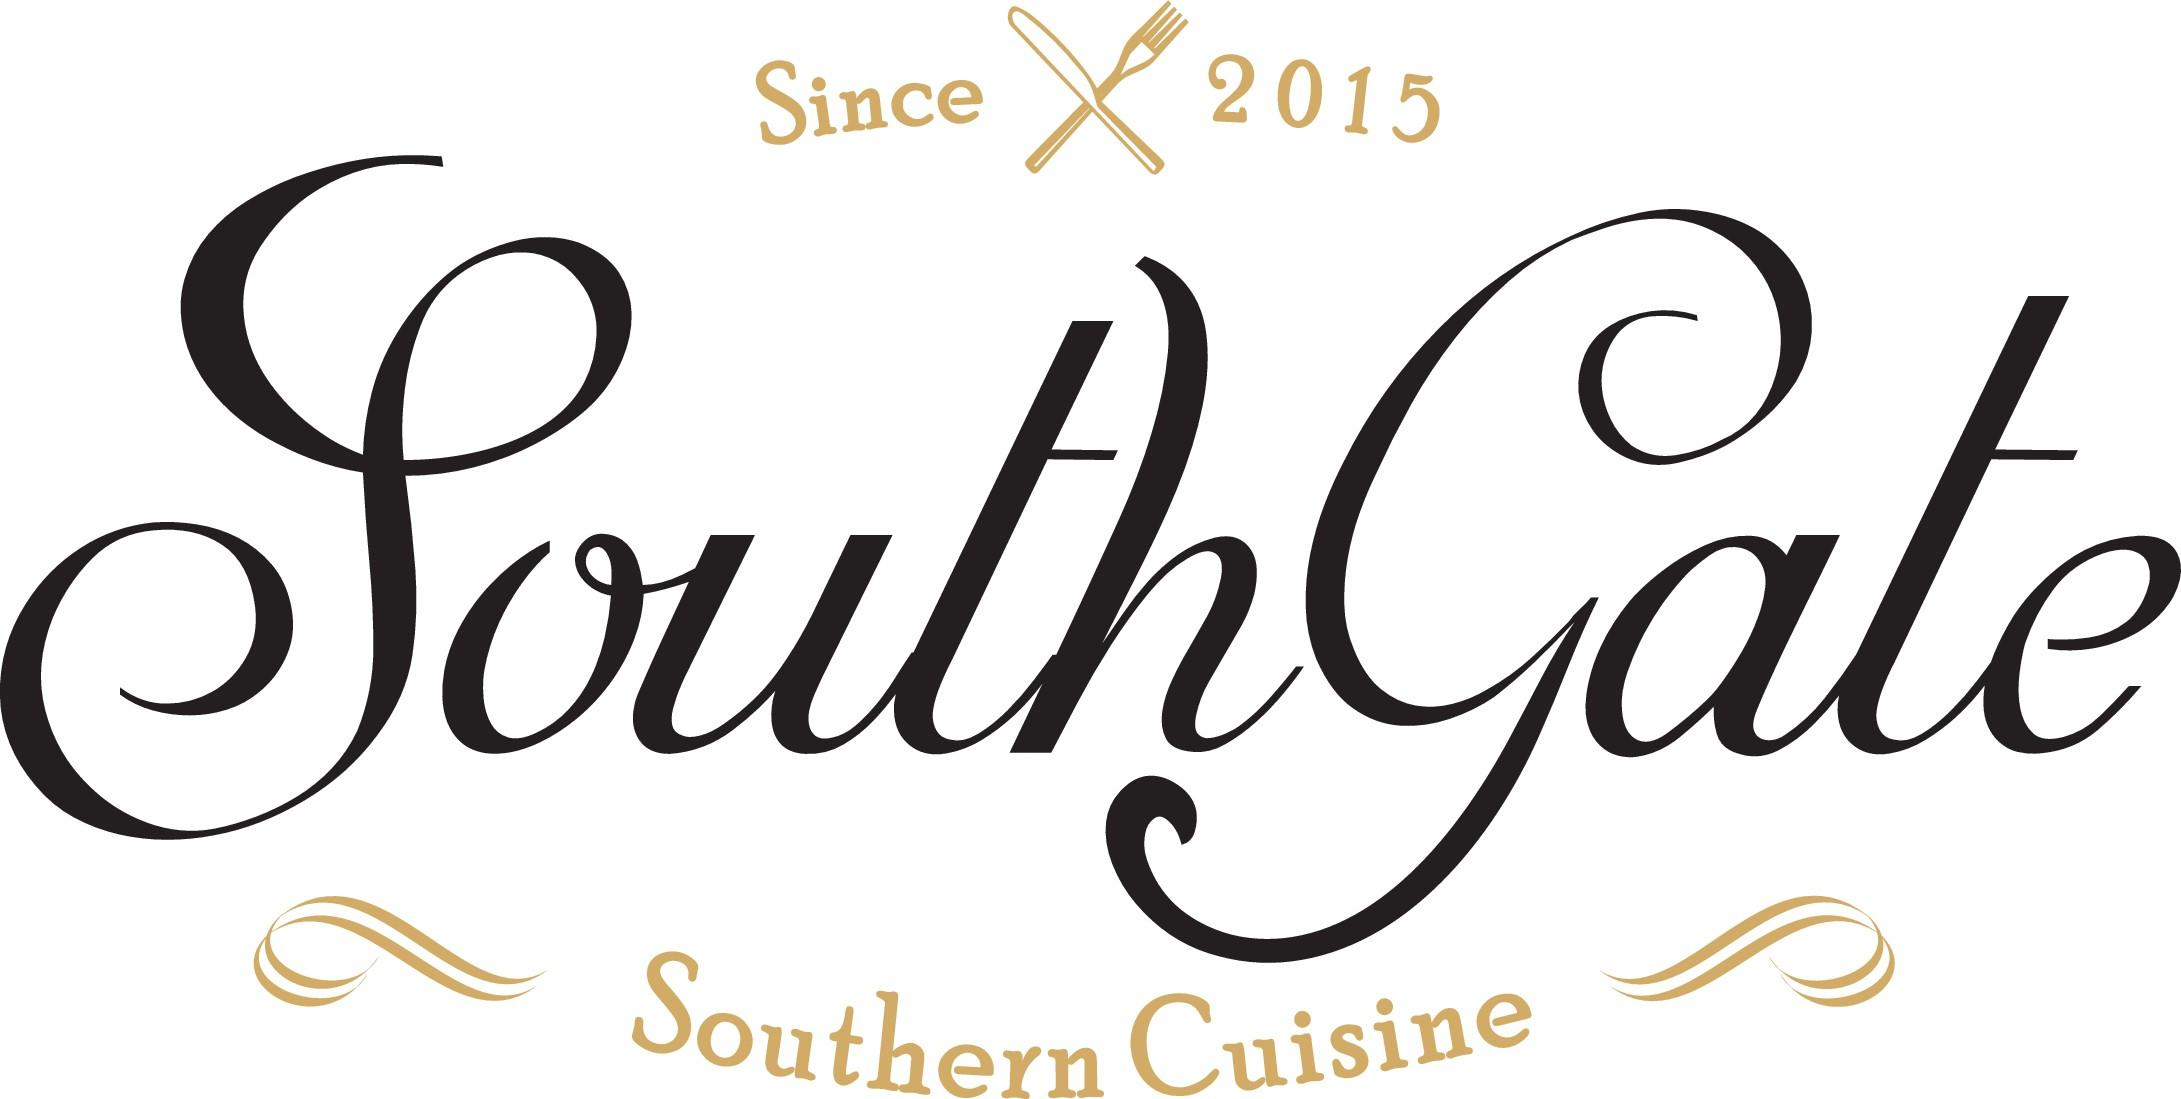 South Gate Restaurant Contest